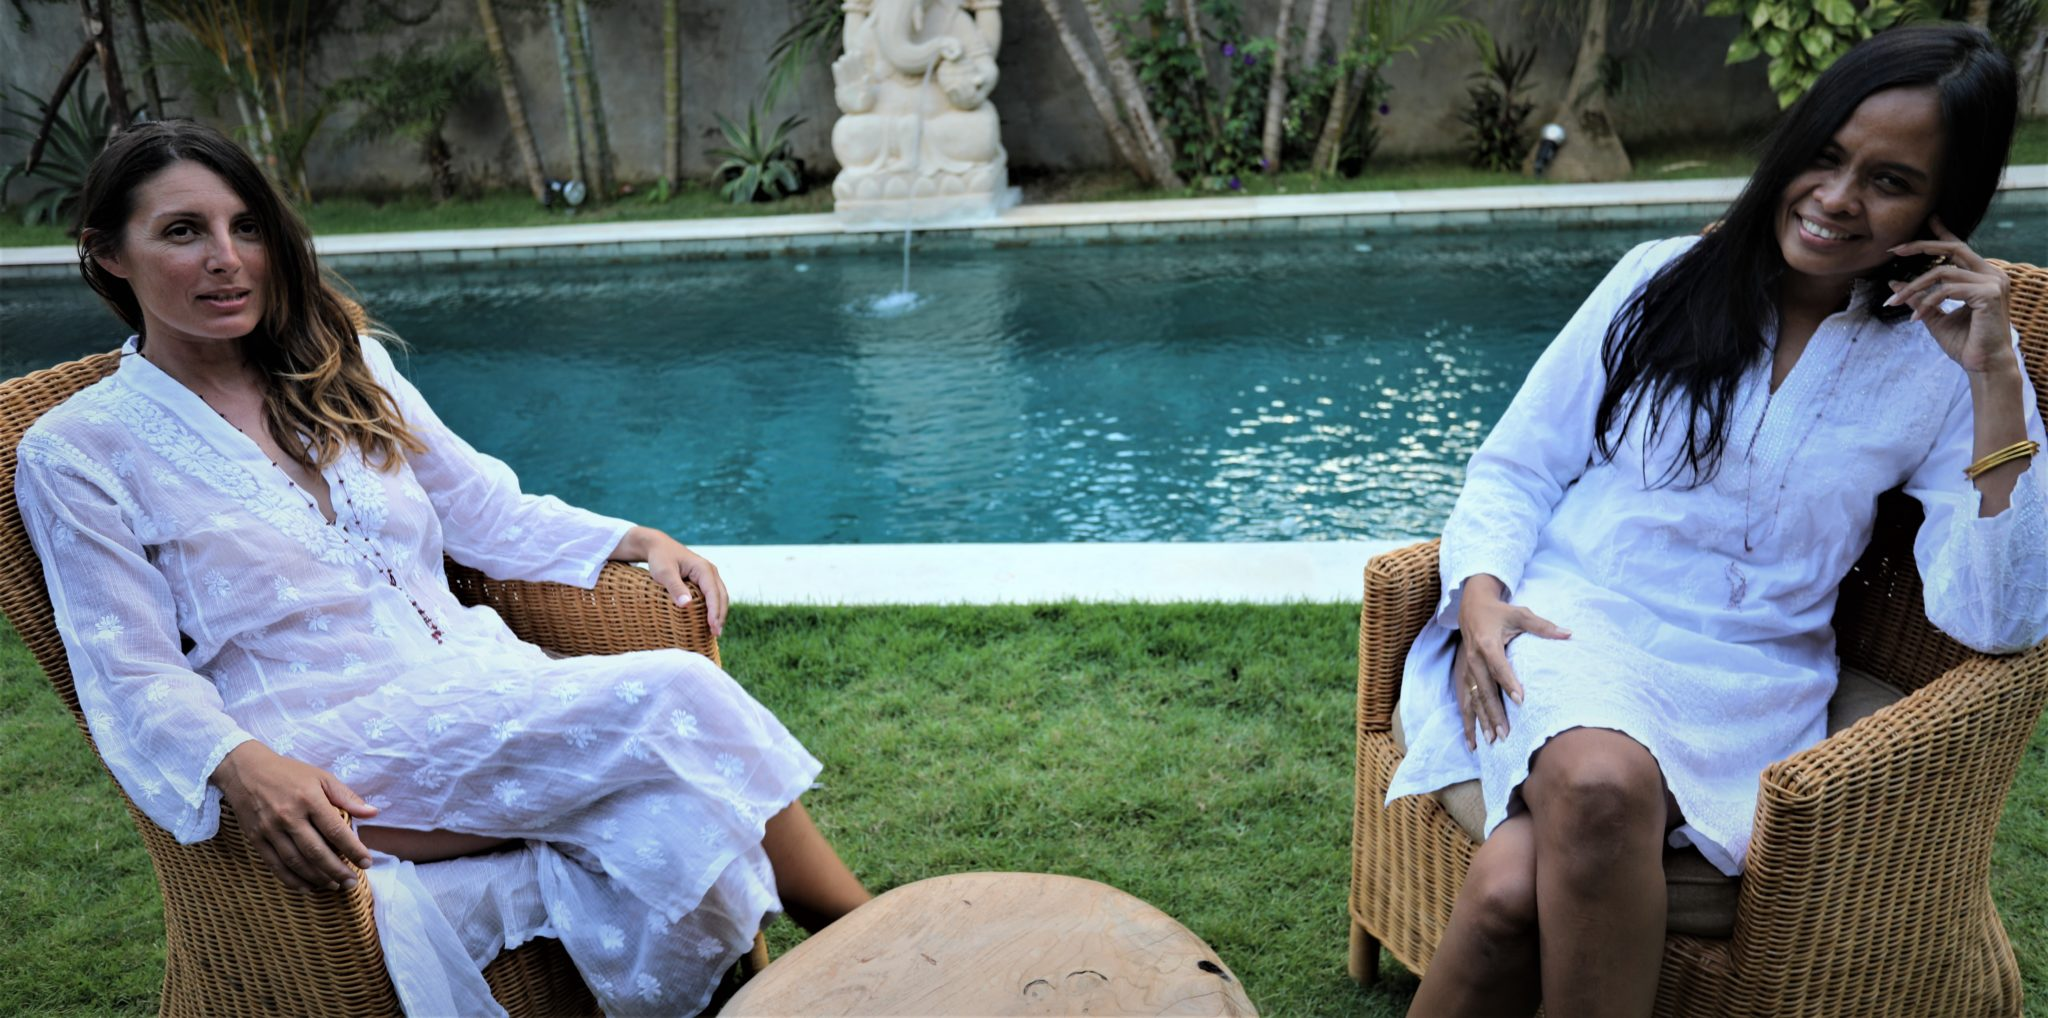 Chikan tunique kurta robe blanc Broderie indienne Lucknow Achat Mes Indes Galantes paris